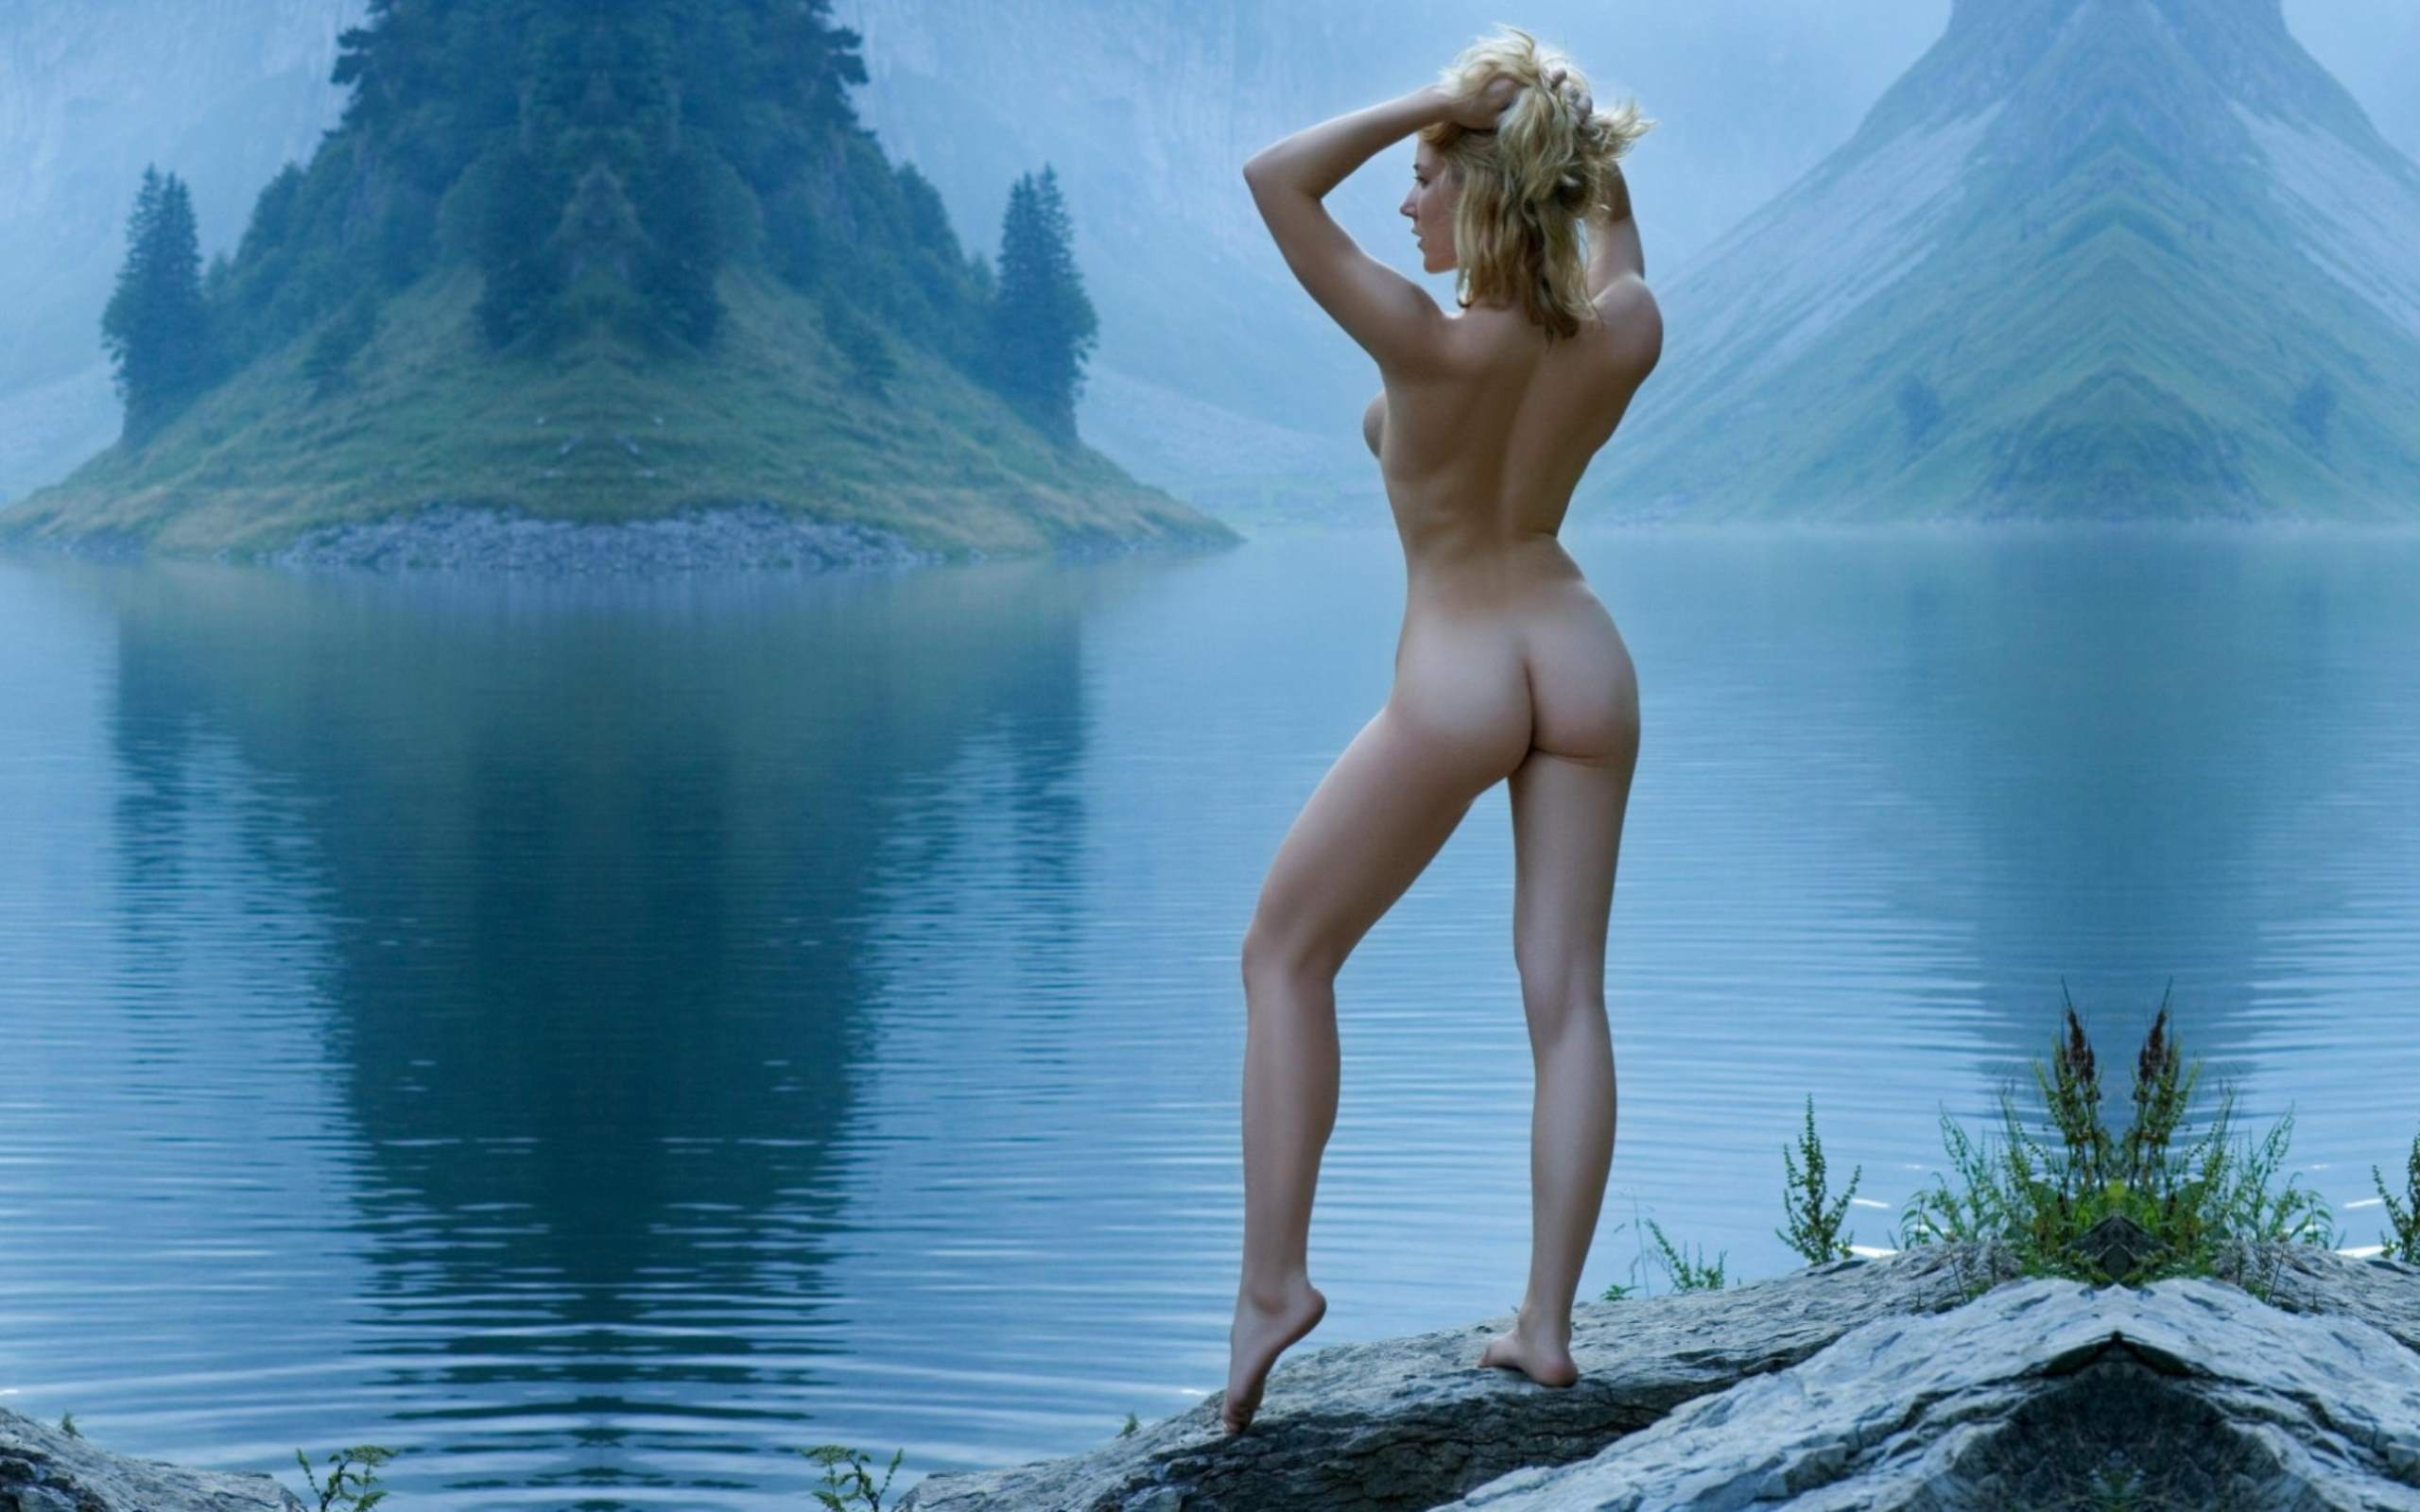 Monester nud girls wallpaper sexy photo